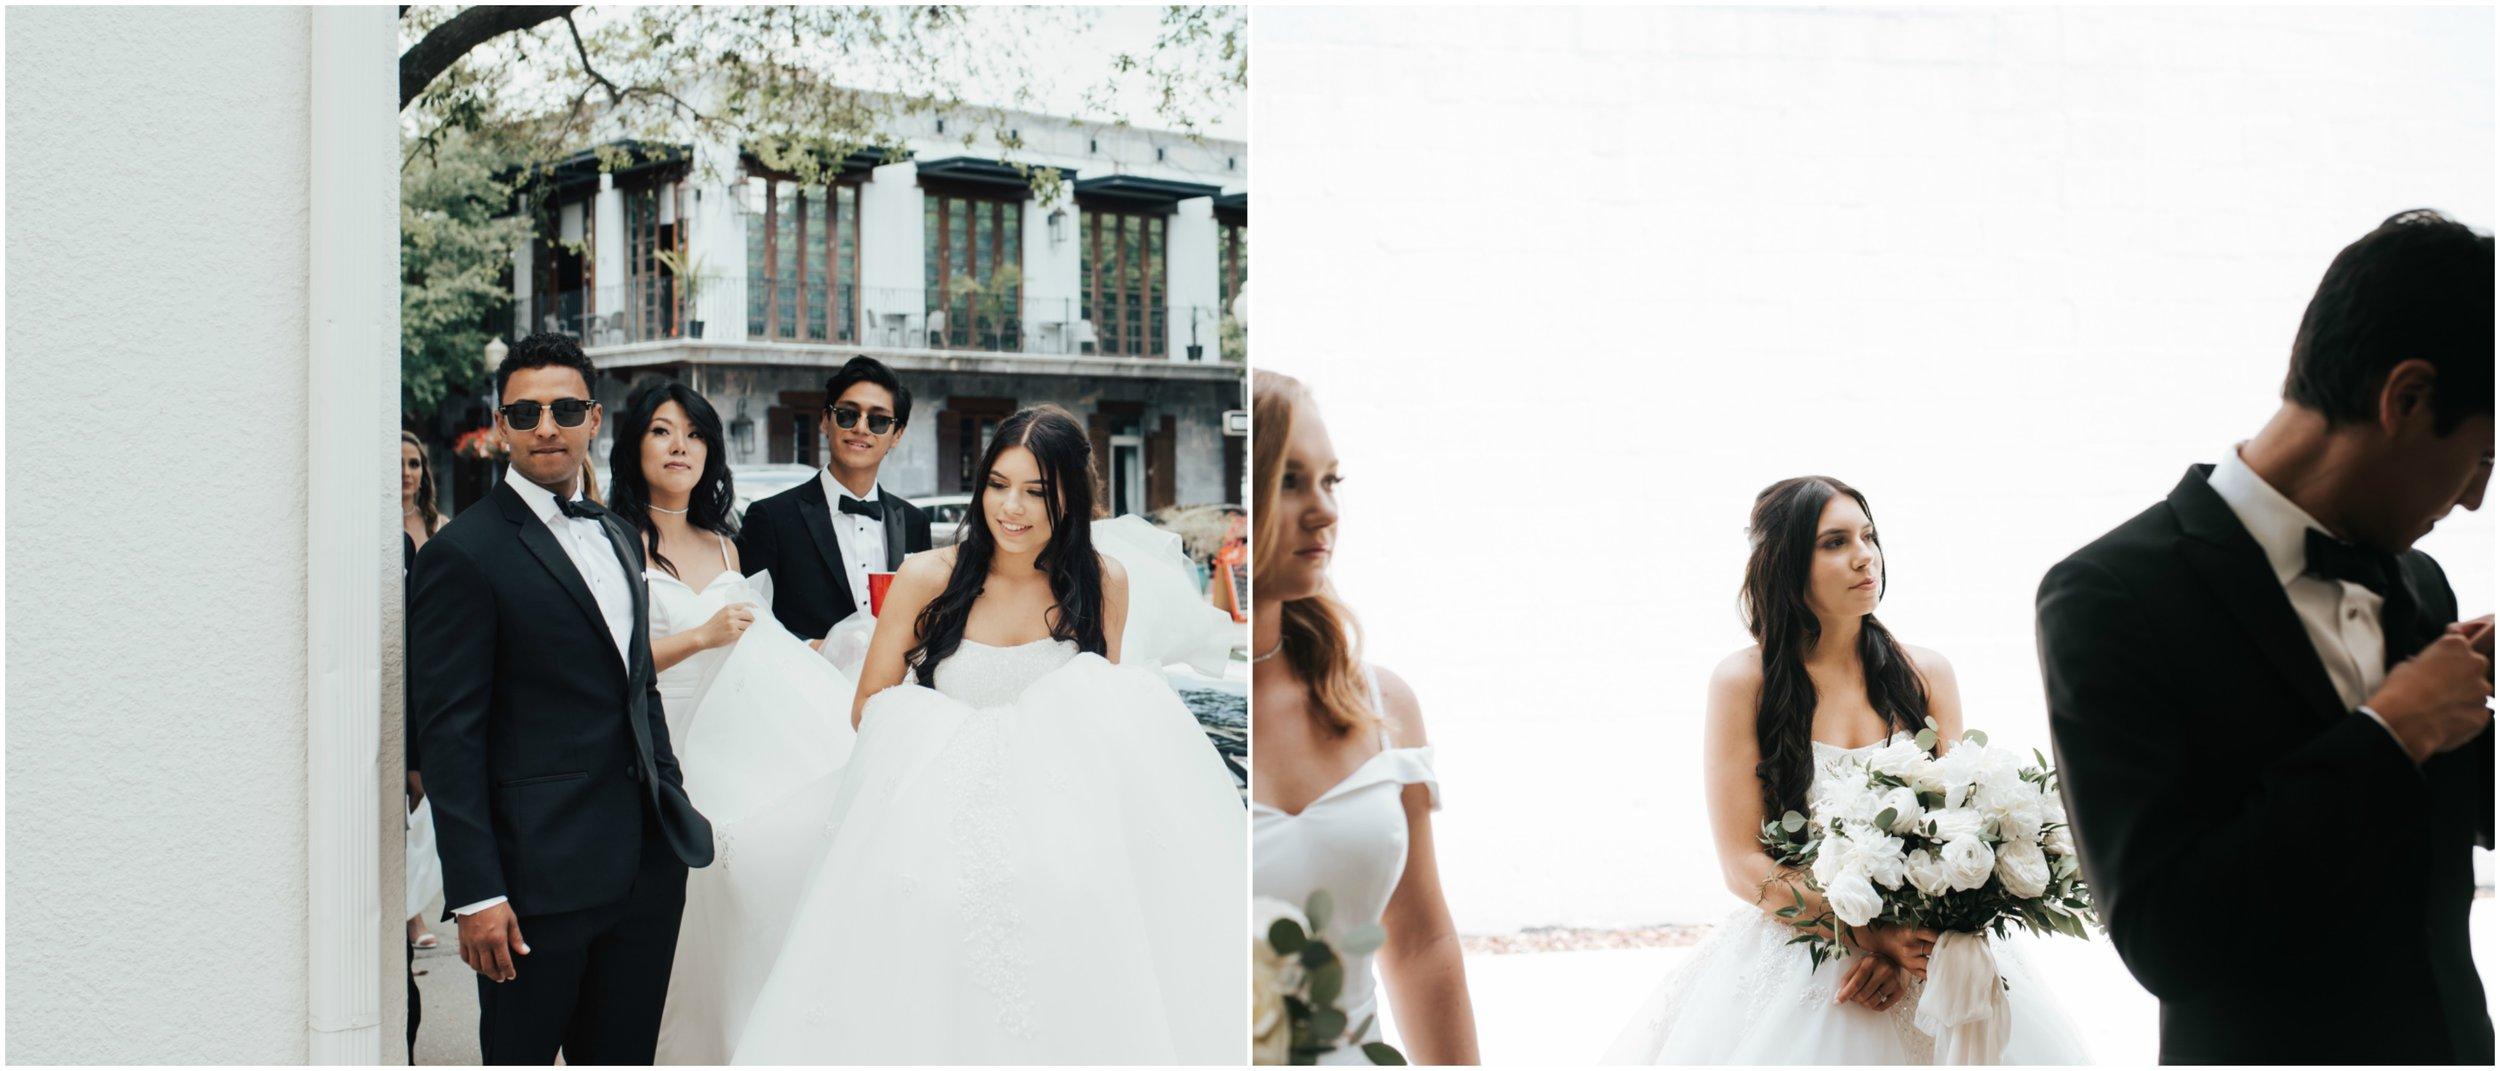 taylor-miguel-wedding-lake-mary-winter-park-candids.jpg